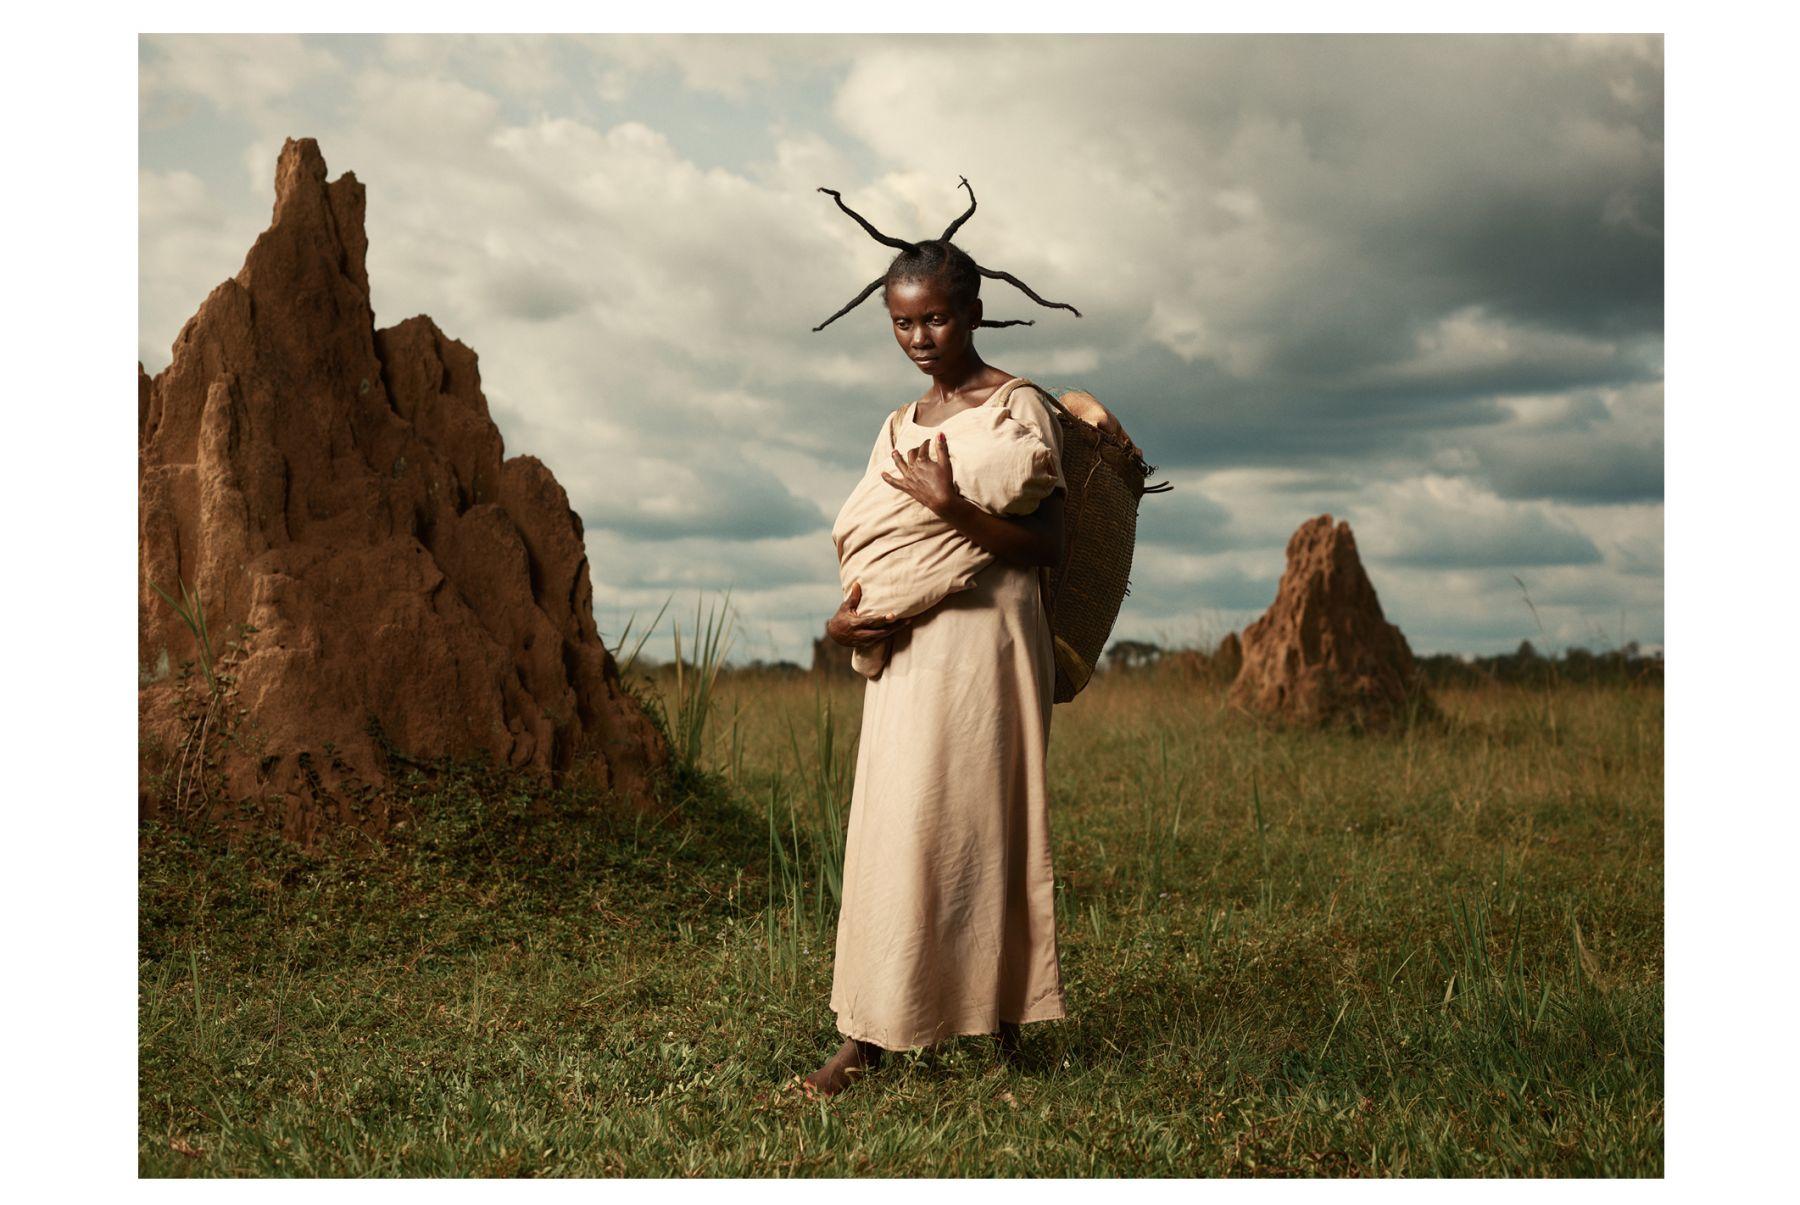 Pieter Henket, My Love, from the series Congo Tales, Howard Greenberg Gallery, 2020